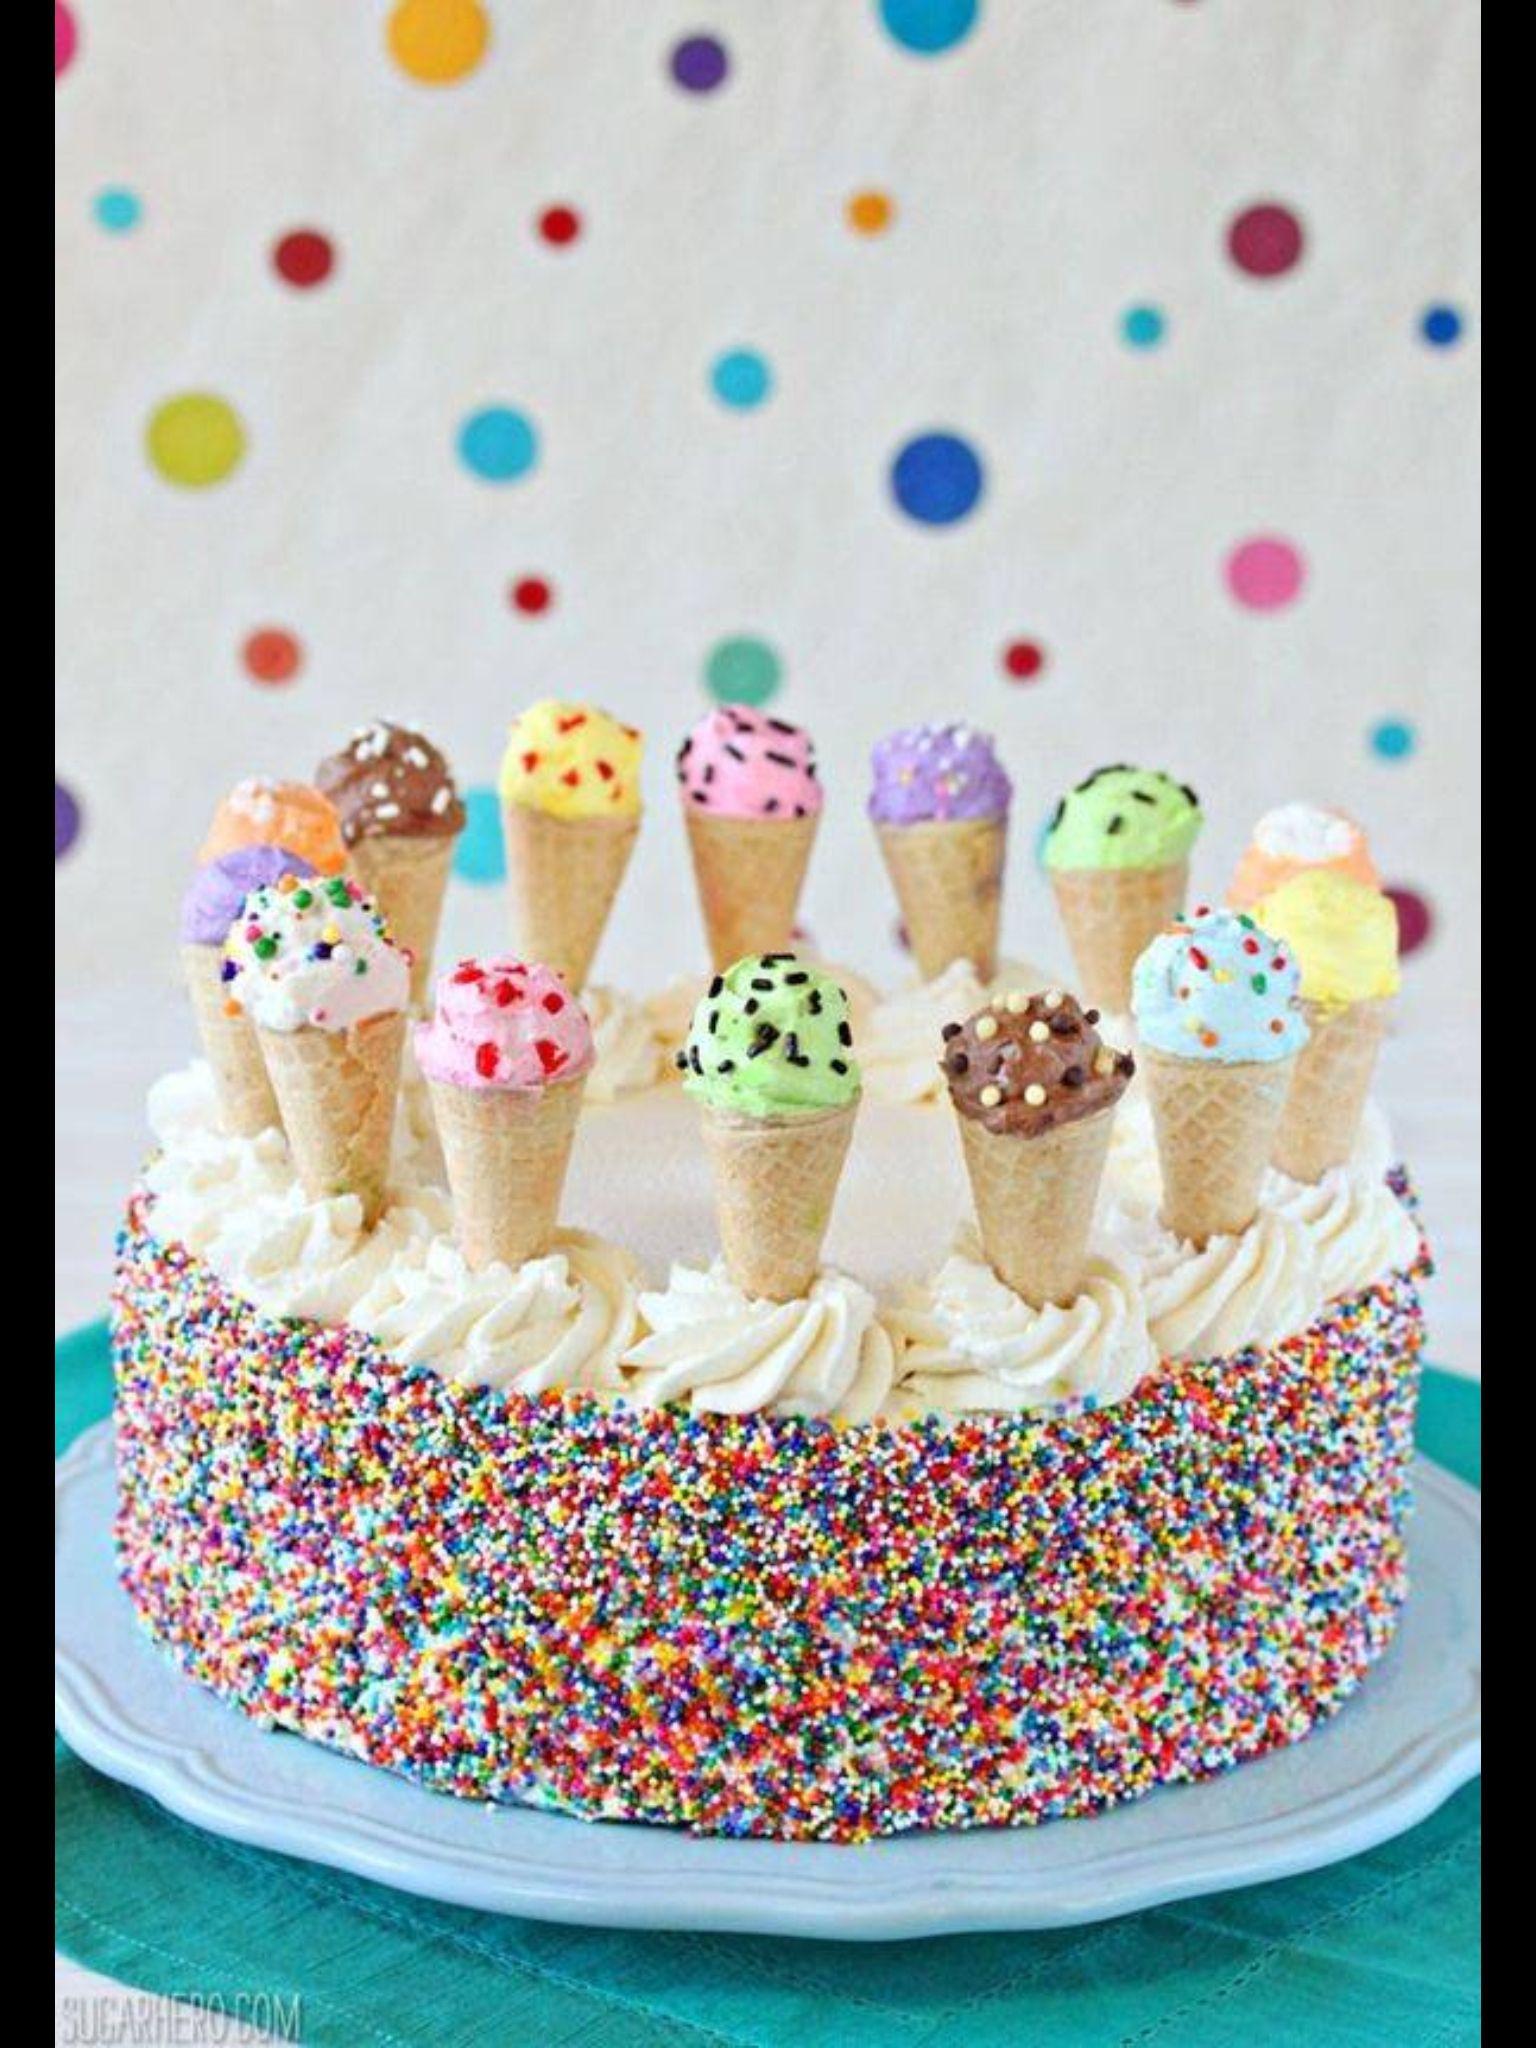 Yummy ice cream cake